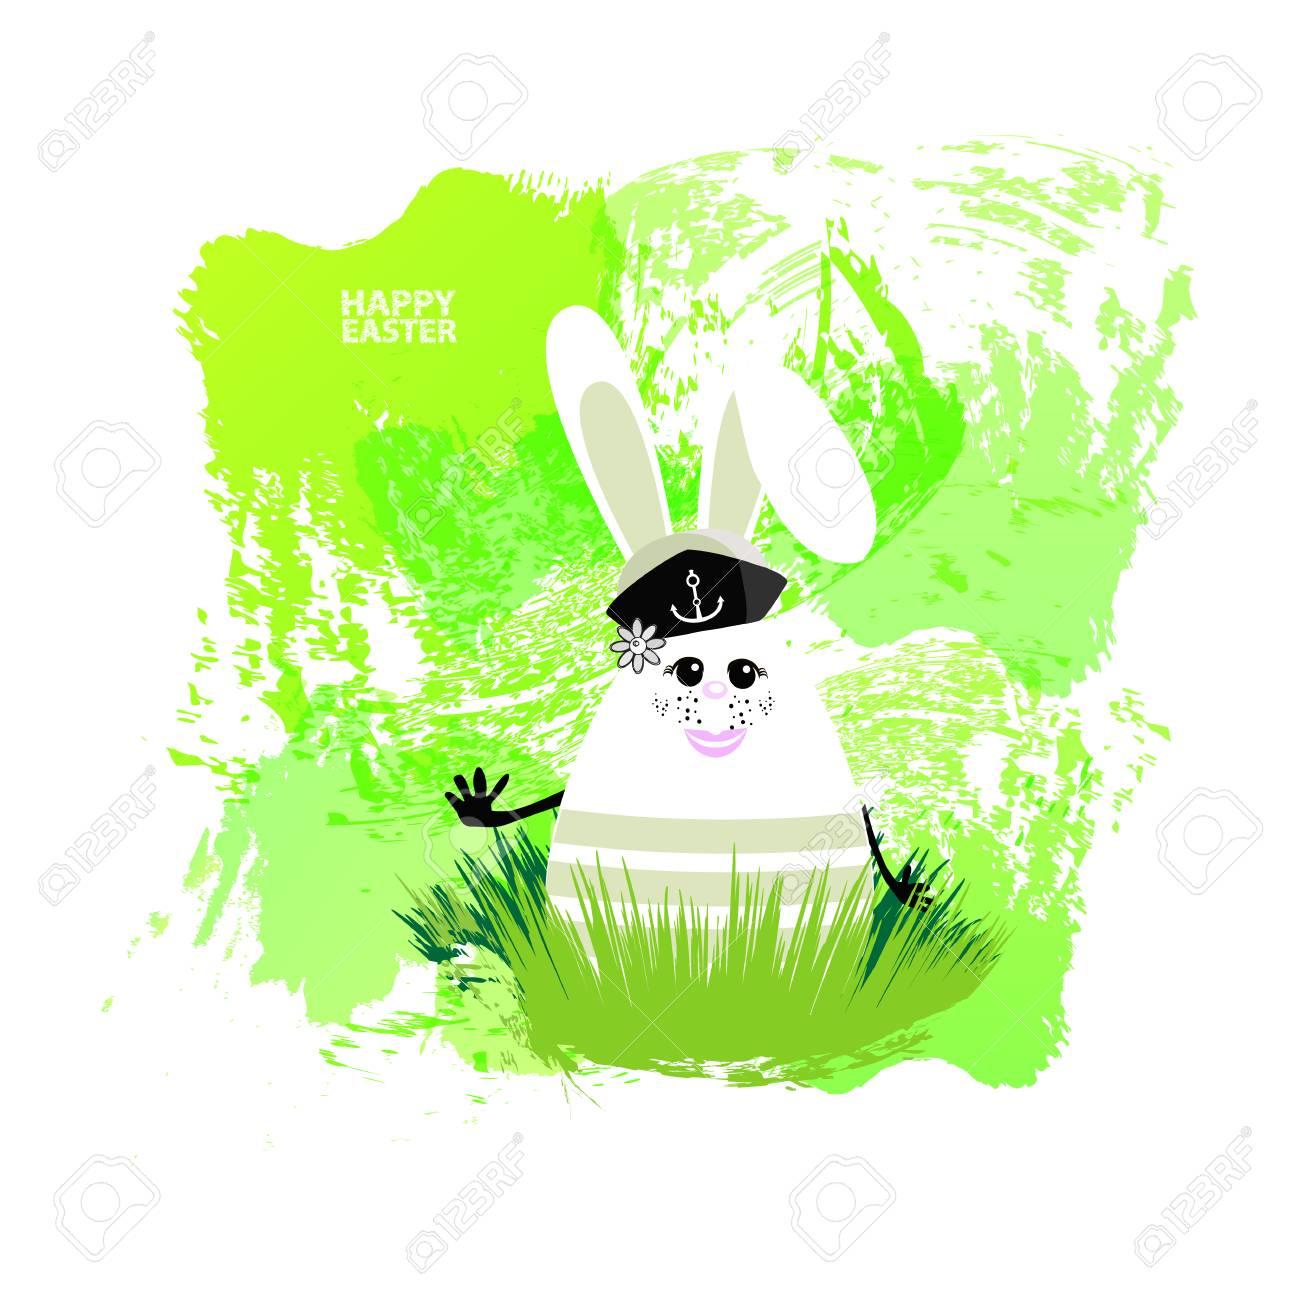 Easter Illustration For Your Design Cheerful Egg Rabbit Symbol